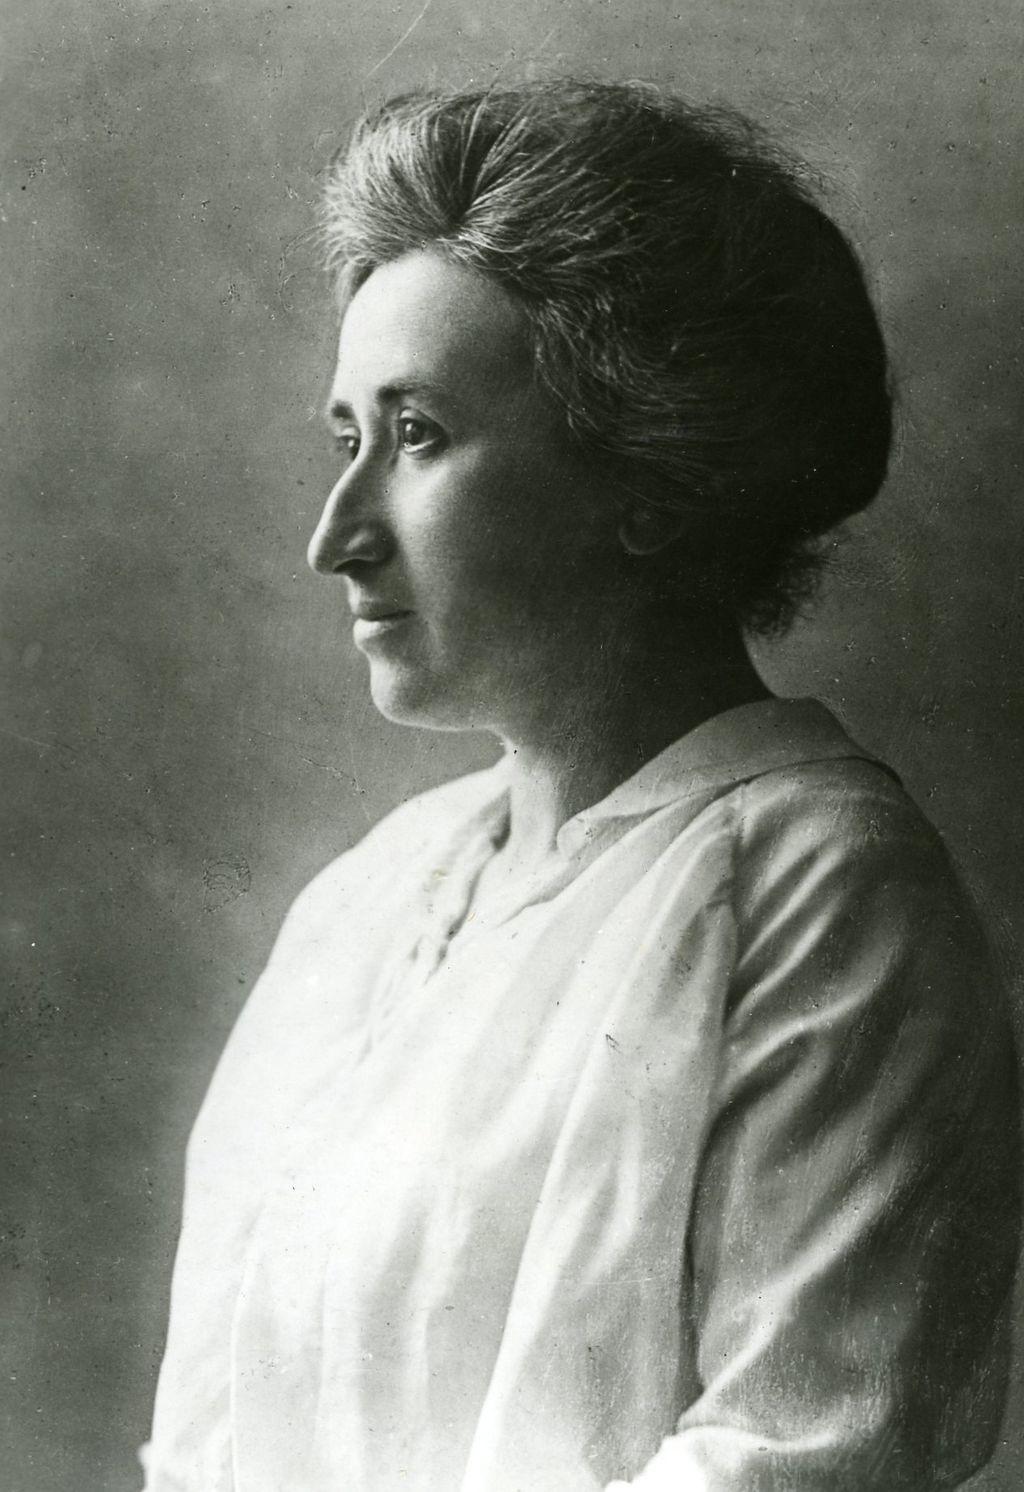 https://upload.wikimedia.org/wikipedia/commons/5/59/Rosa_Luxemburg-2.2.jpg